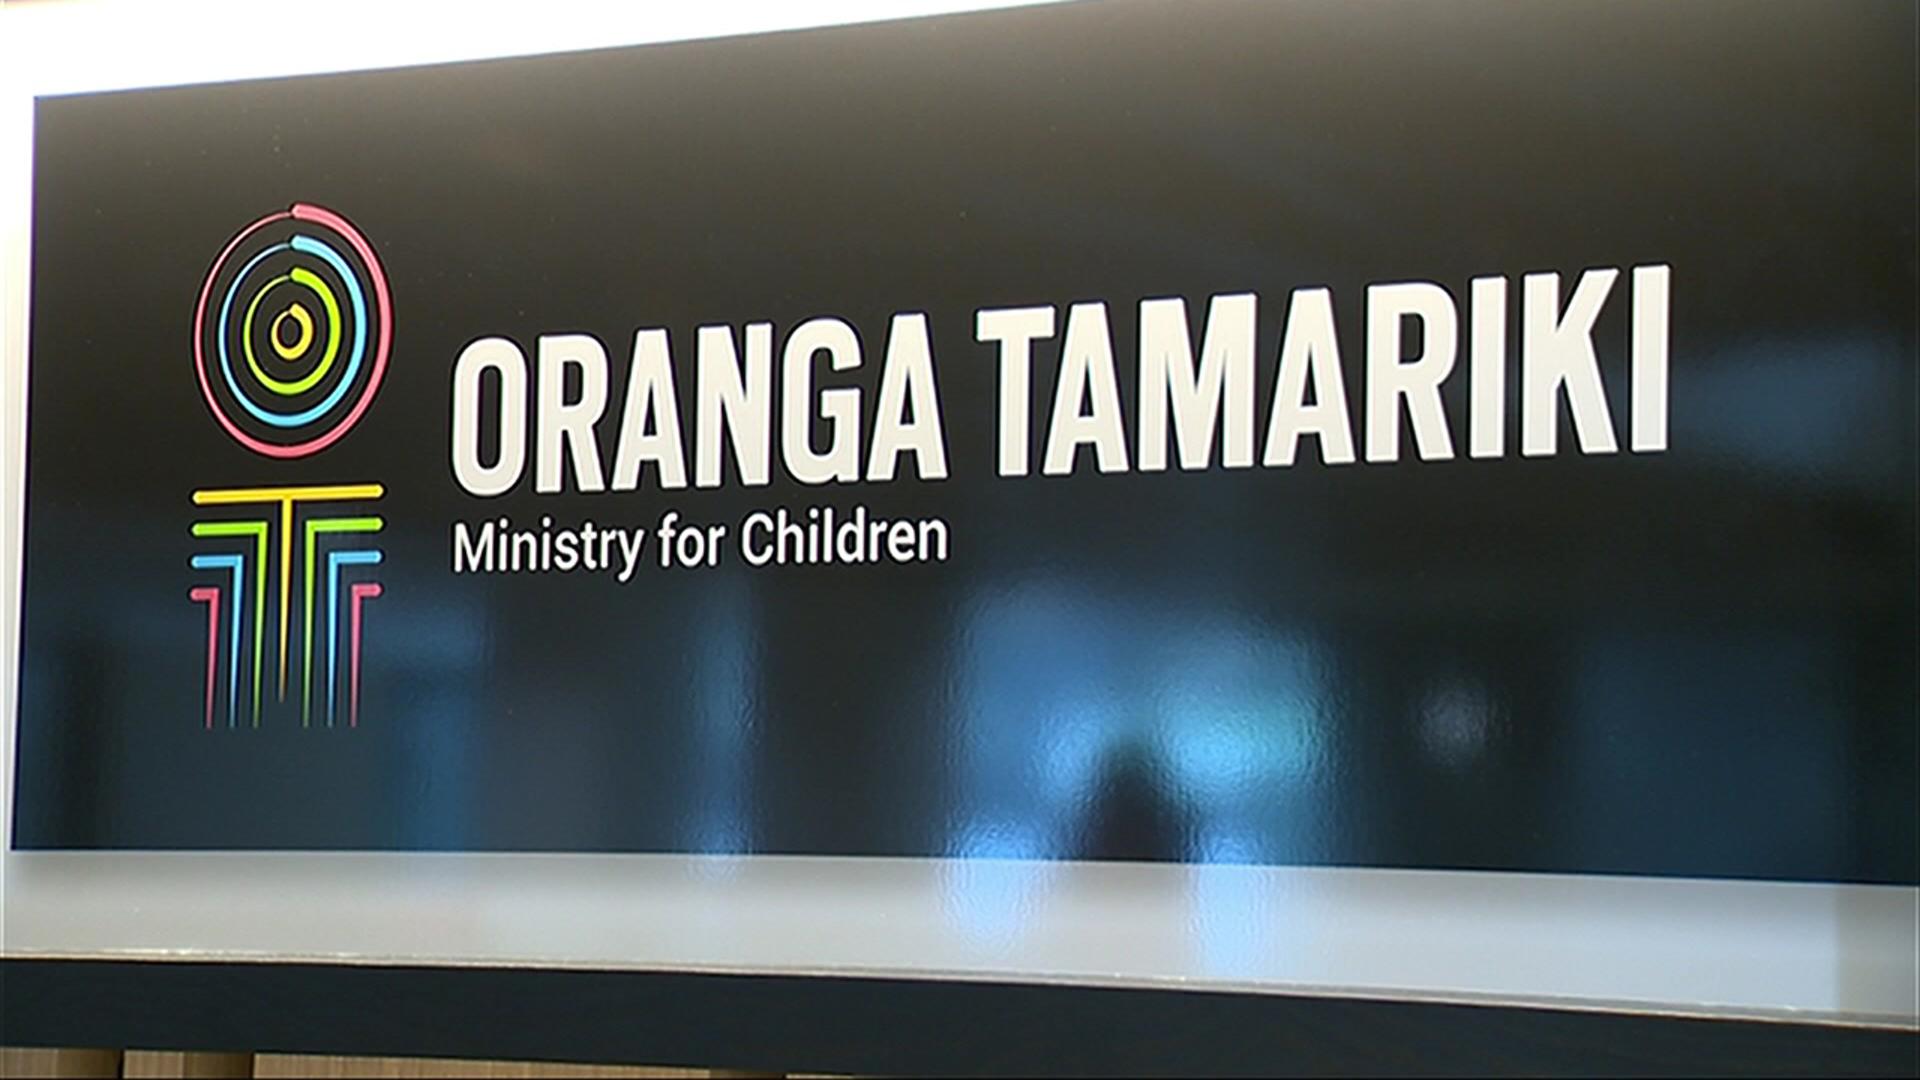 Video for Oranga Tamariki reveals new measures to avoid harm to children